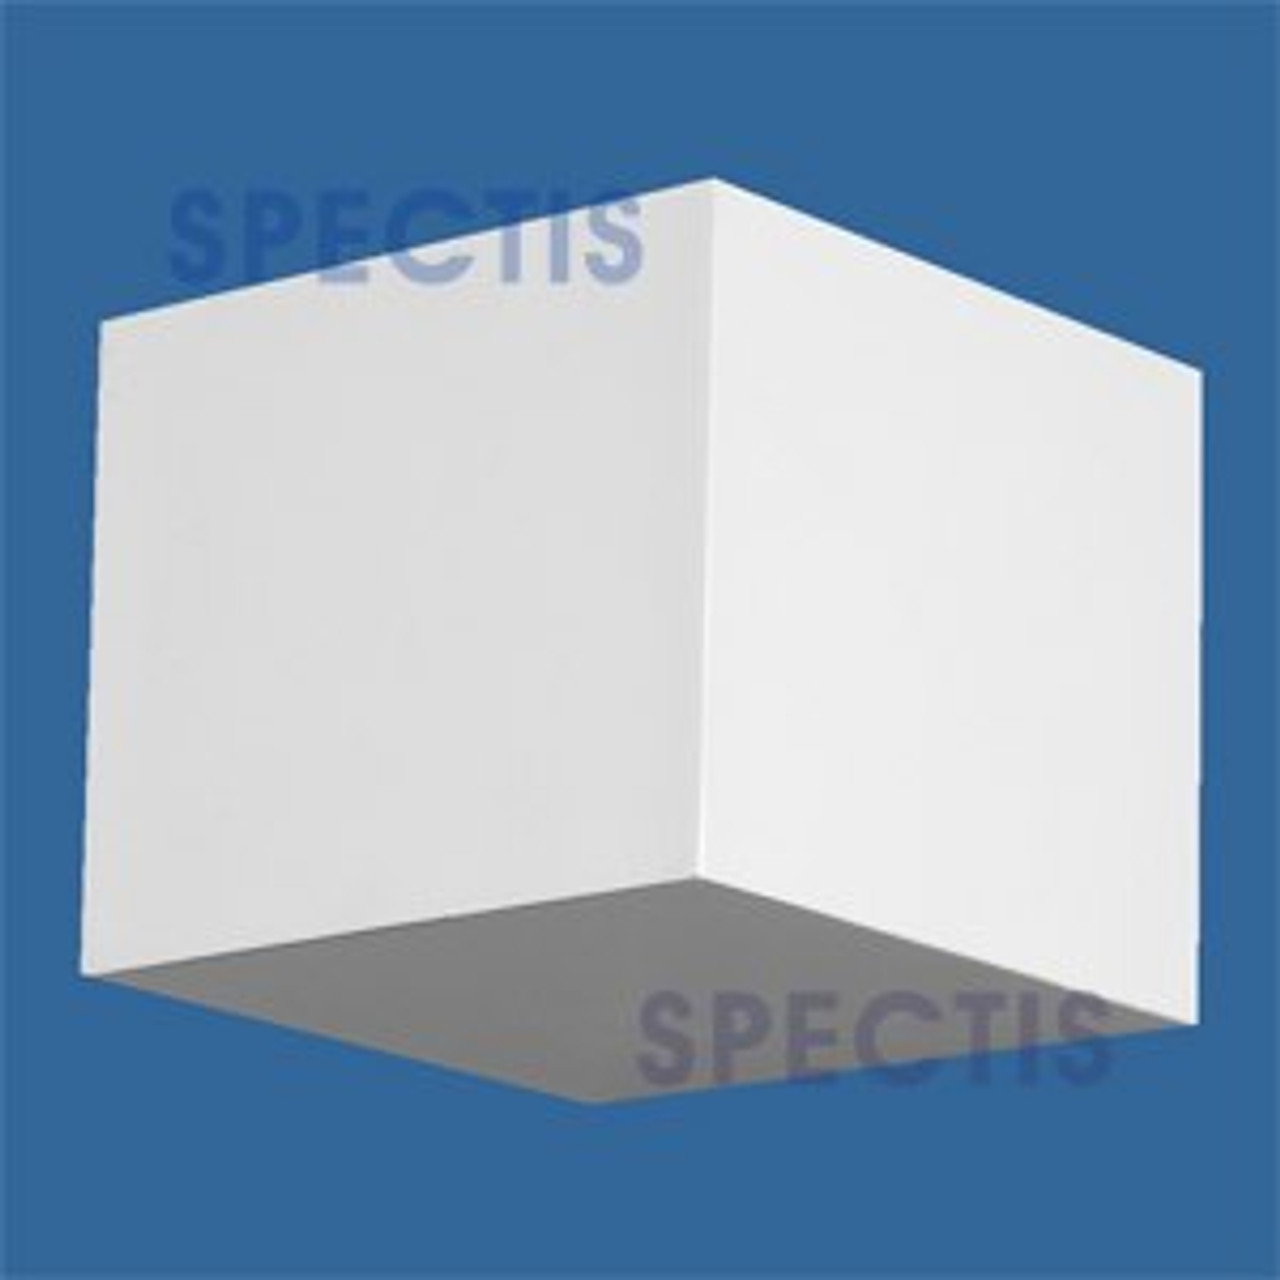 "BL2722 Corbel Block or Eave Bracket 10""W x 8.5""H x 10"" P"